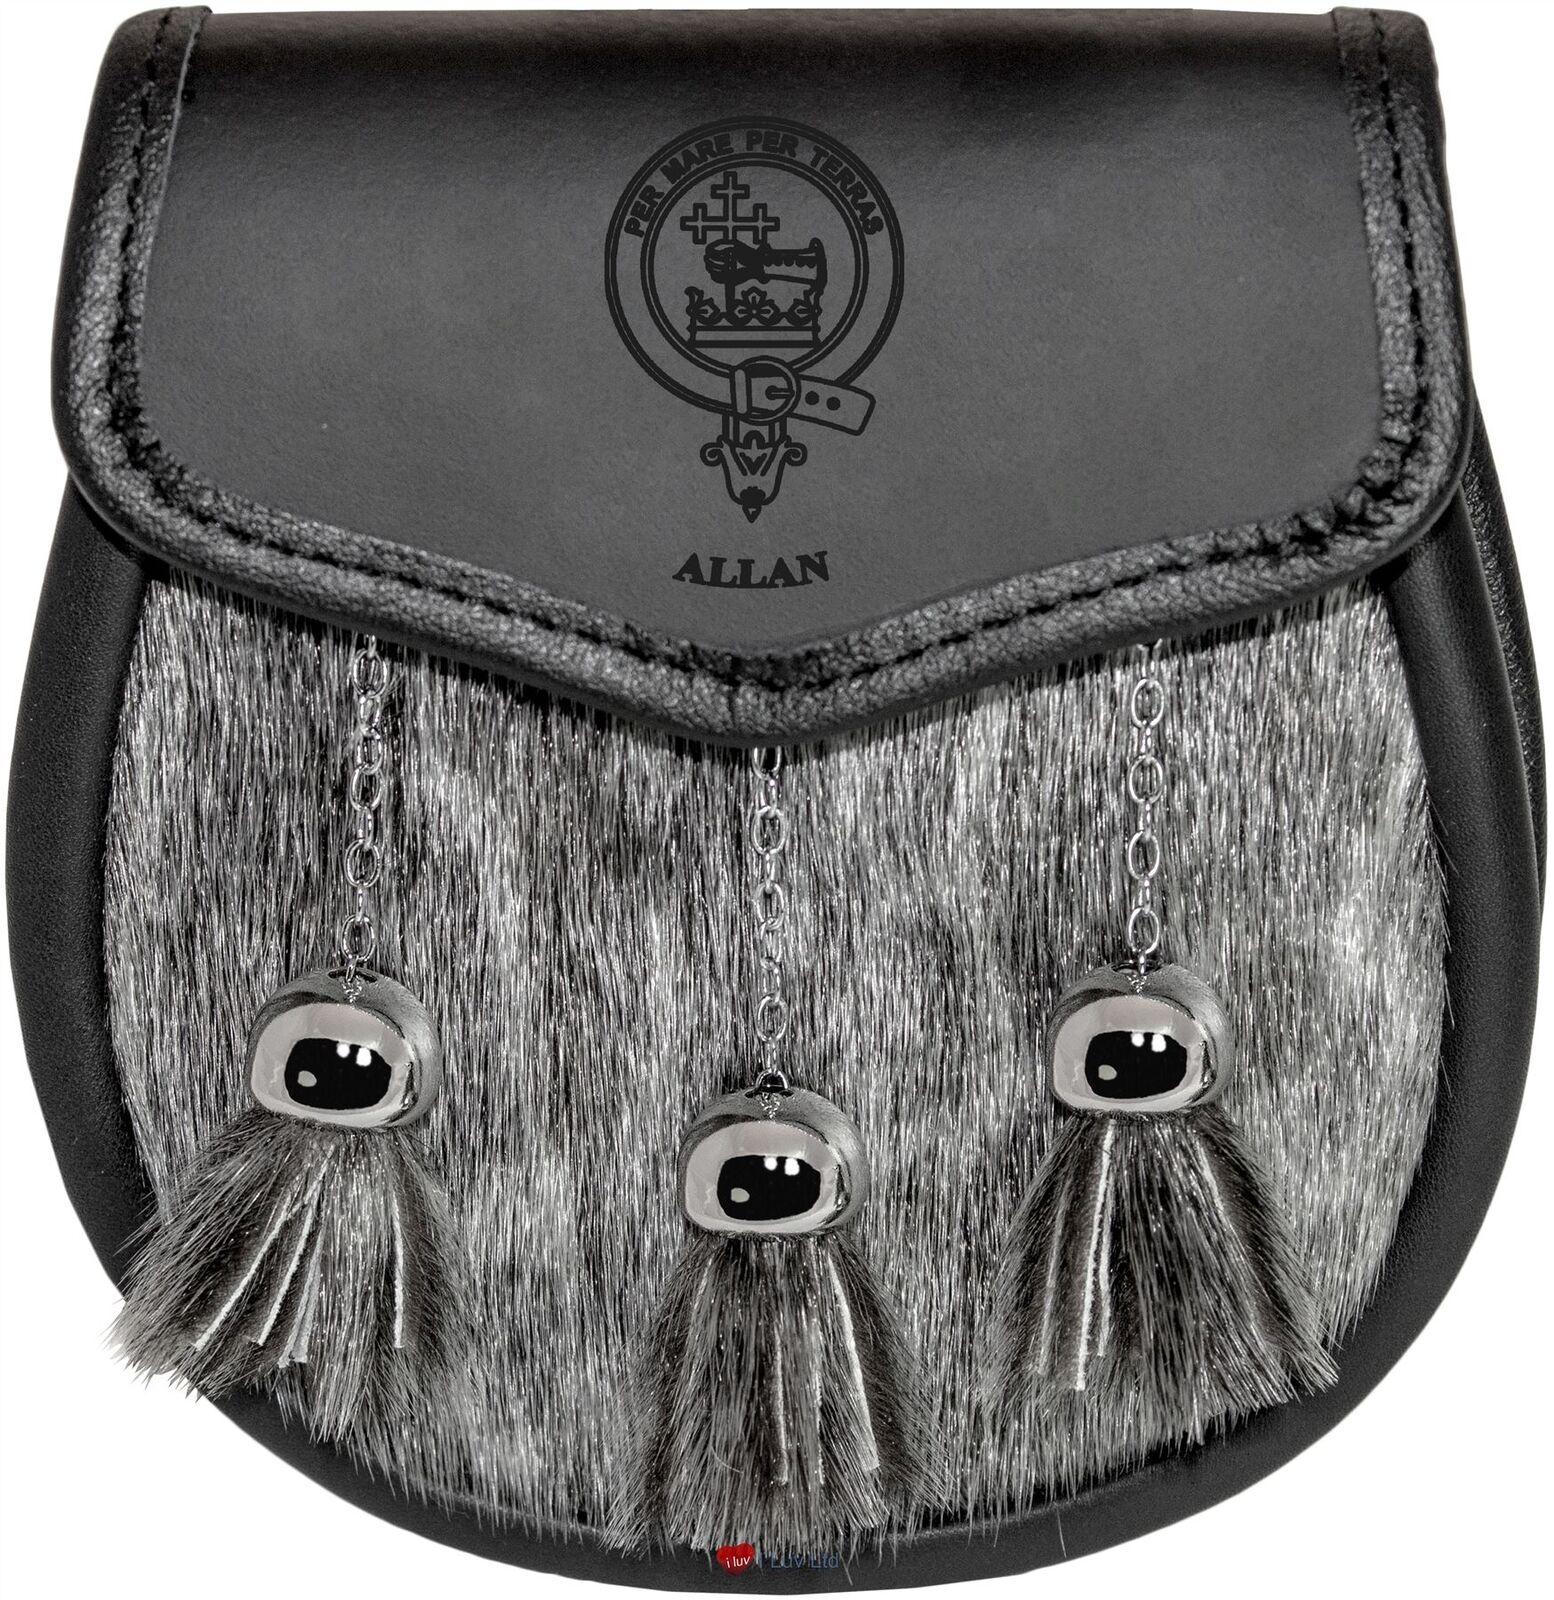 Allan Semi Dress Sporran Fur Plain Leather Flap Scottish Clan Crest